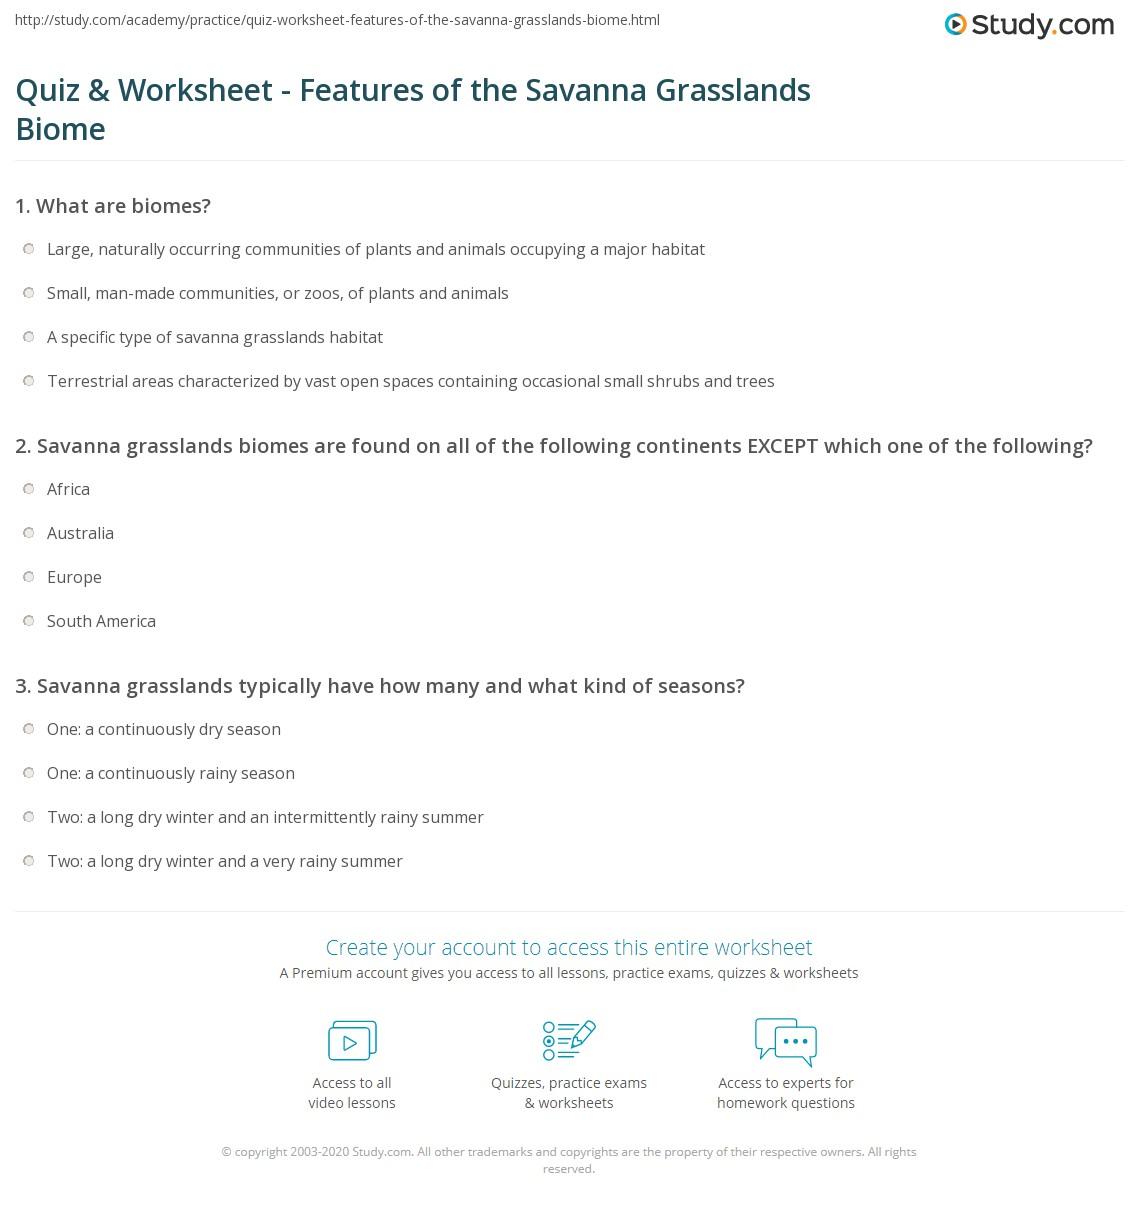 quiz worksheet features of the savanna grasslands biome. Black Bedroom Furniture Sets. Home Design Ideas